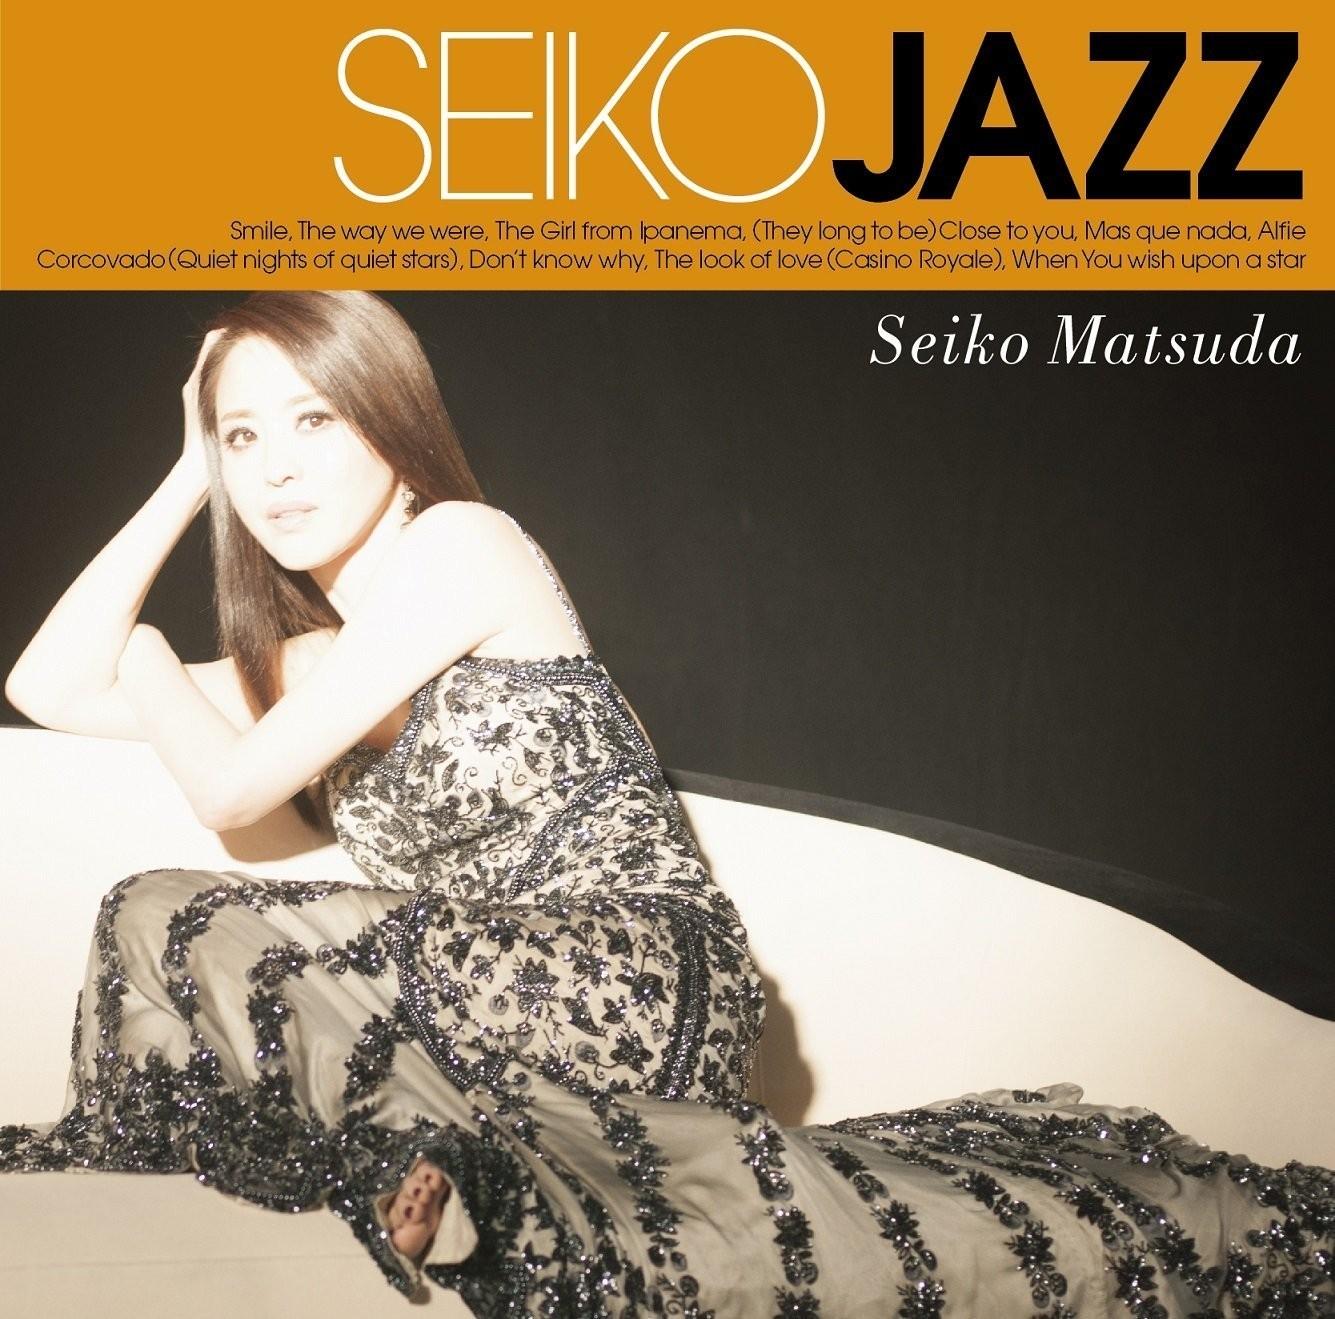 松田聖子 (Seiko Matsuda) – SEIKO JAZZ [24bit Lossless + MP3 320 / WEB] [2017.03.29]